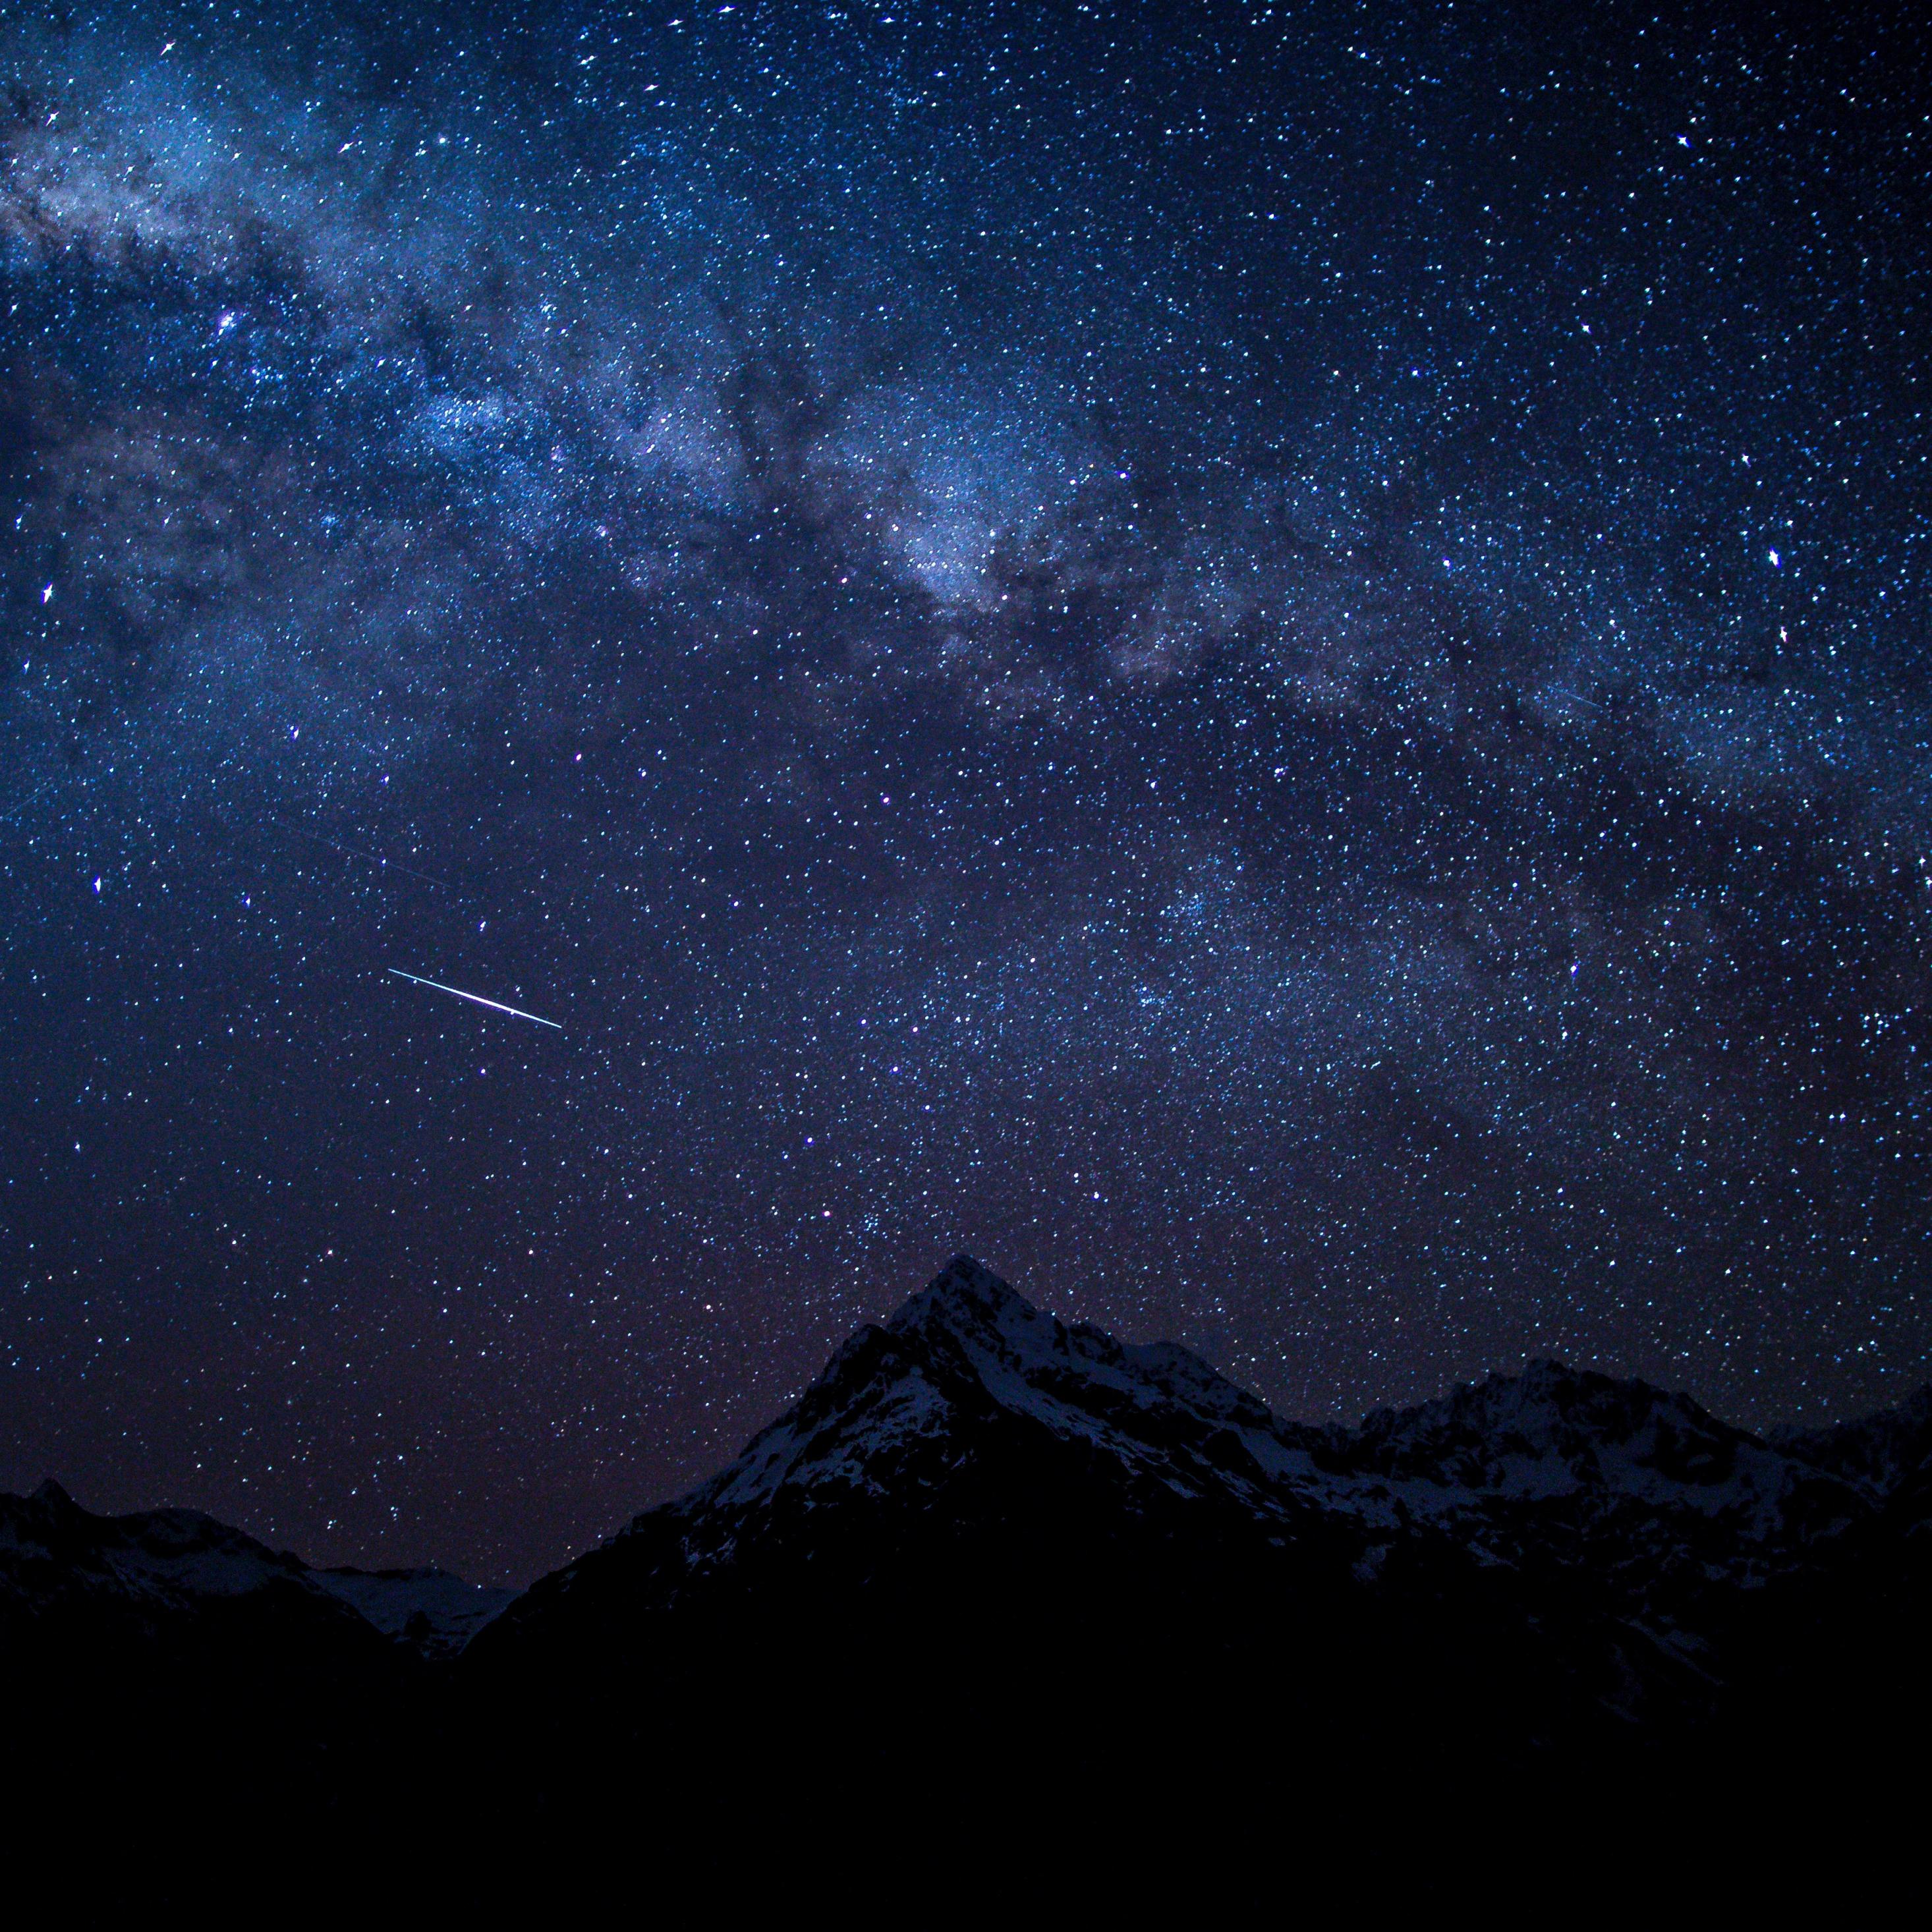 Starry sky night mountians 5k